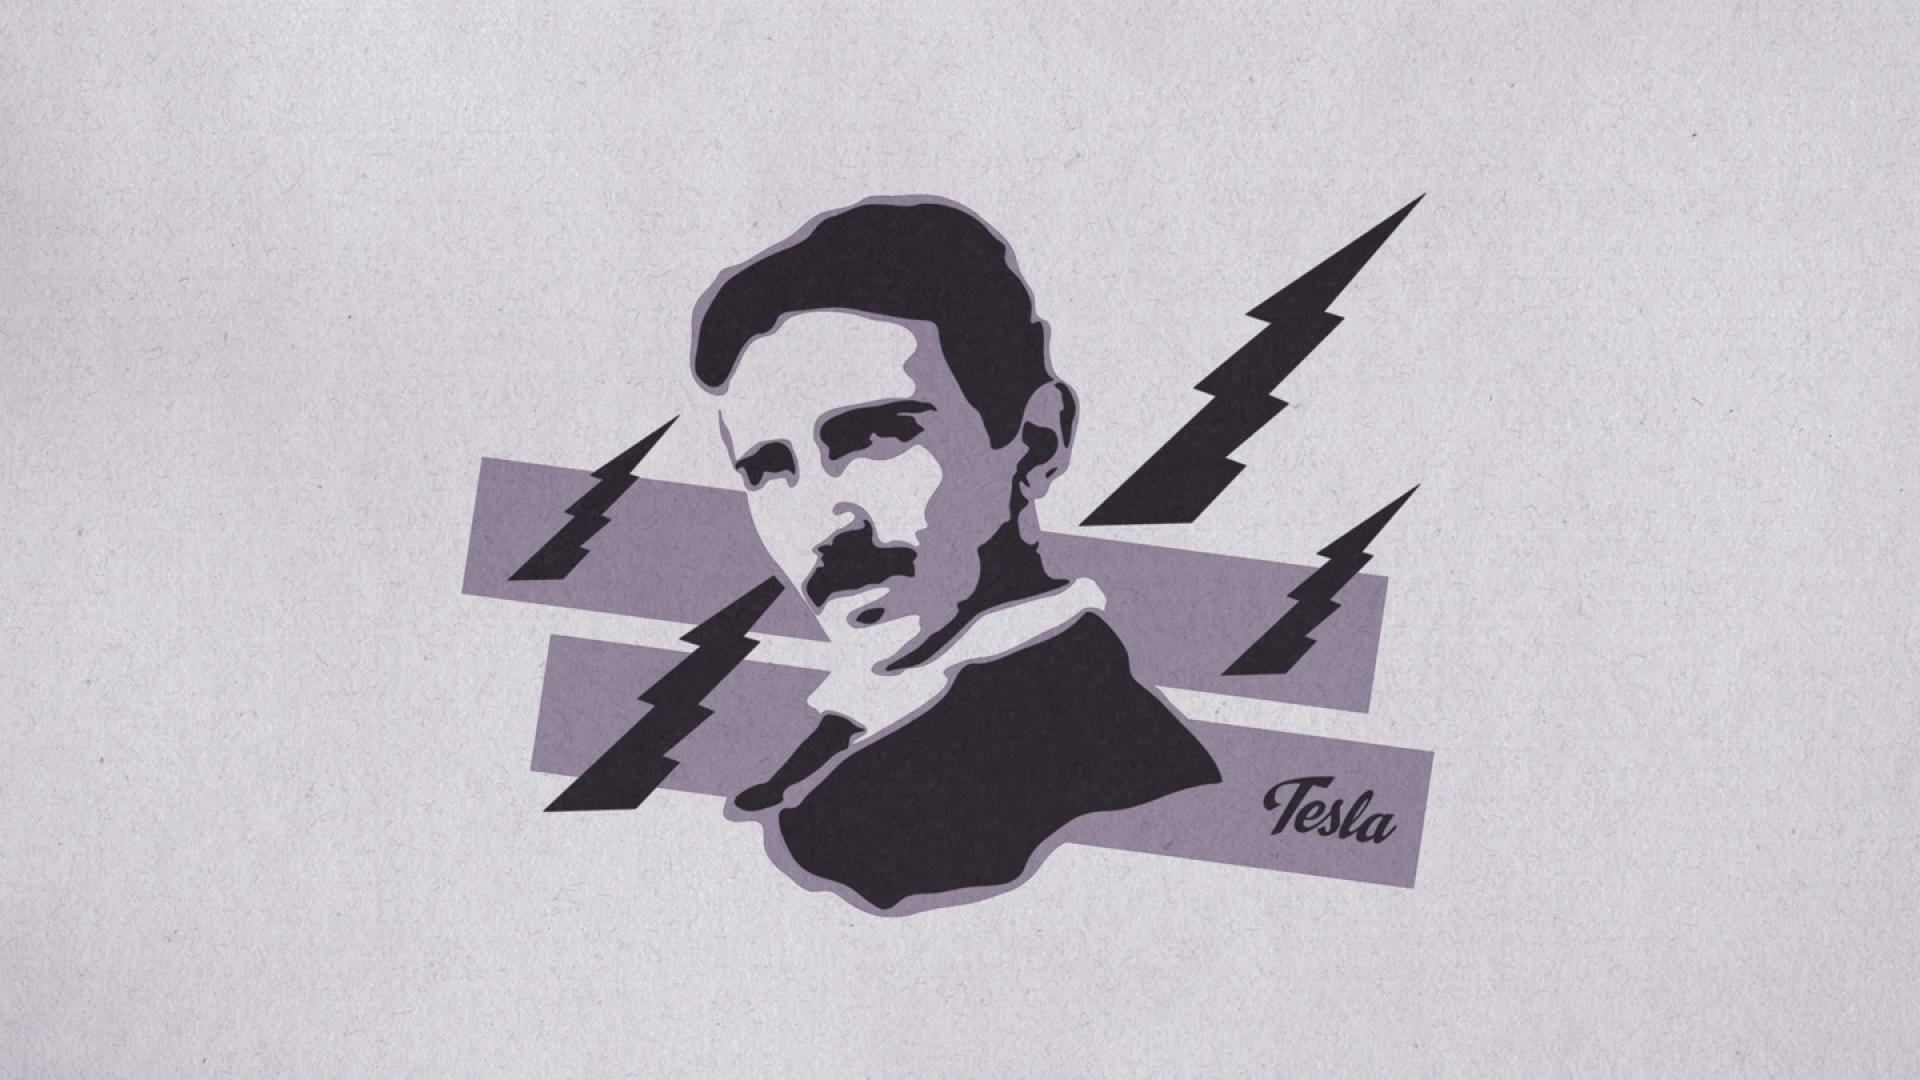 Nikola Tesla Wallpapers Images Photos Pictures Backgrounds